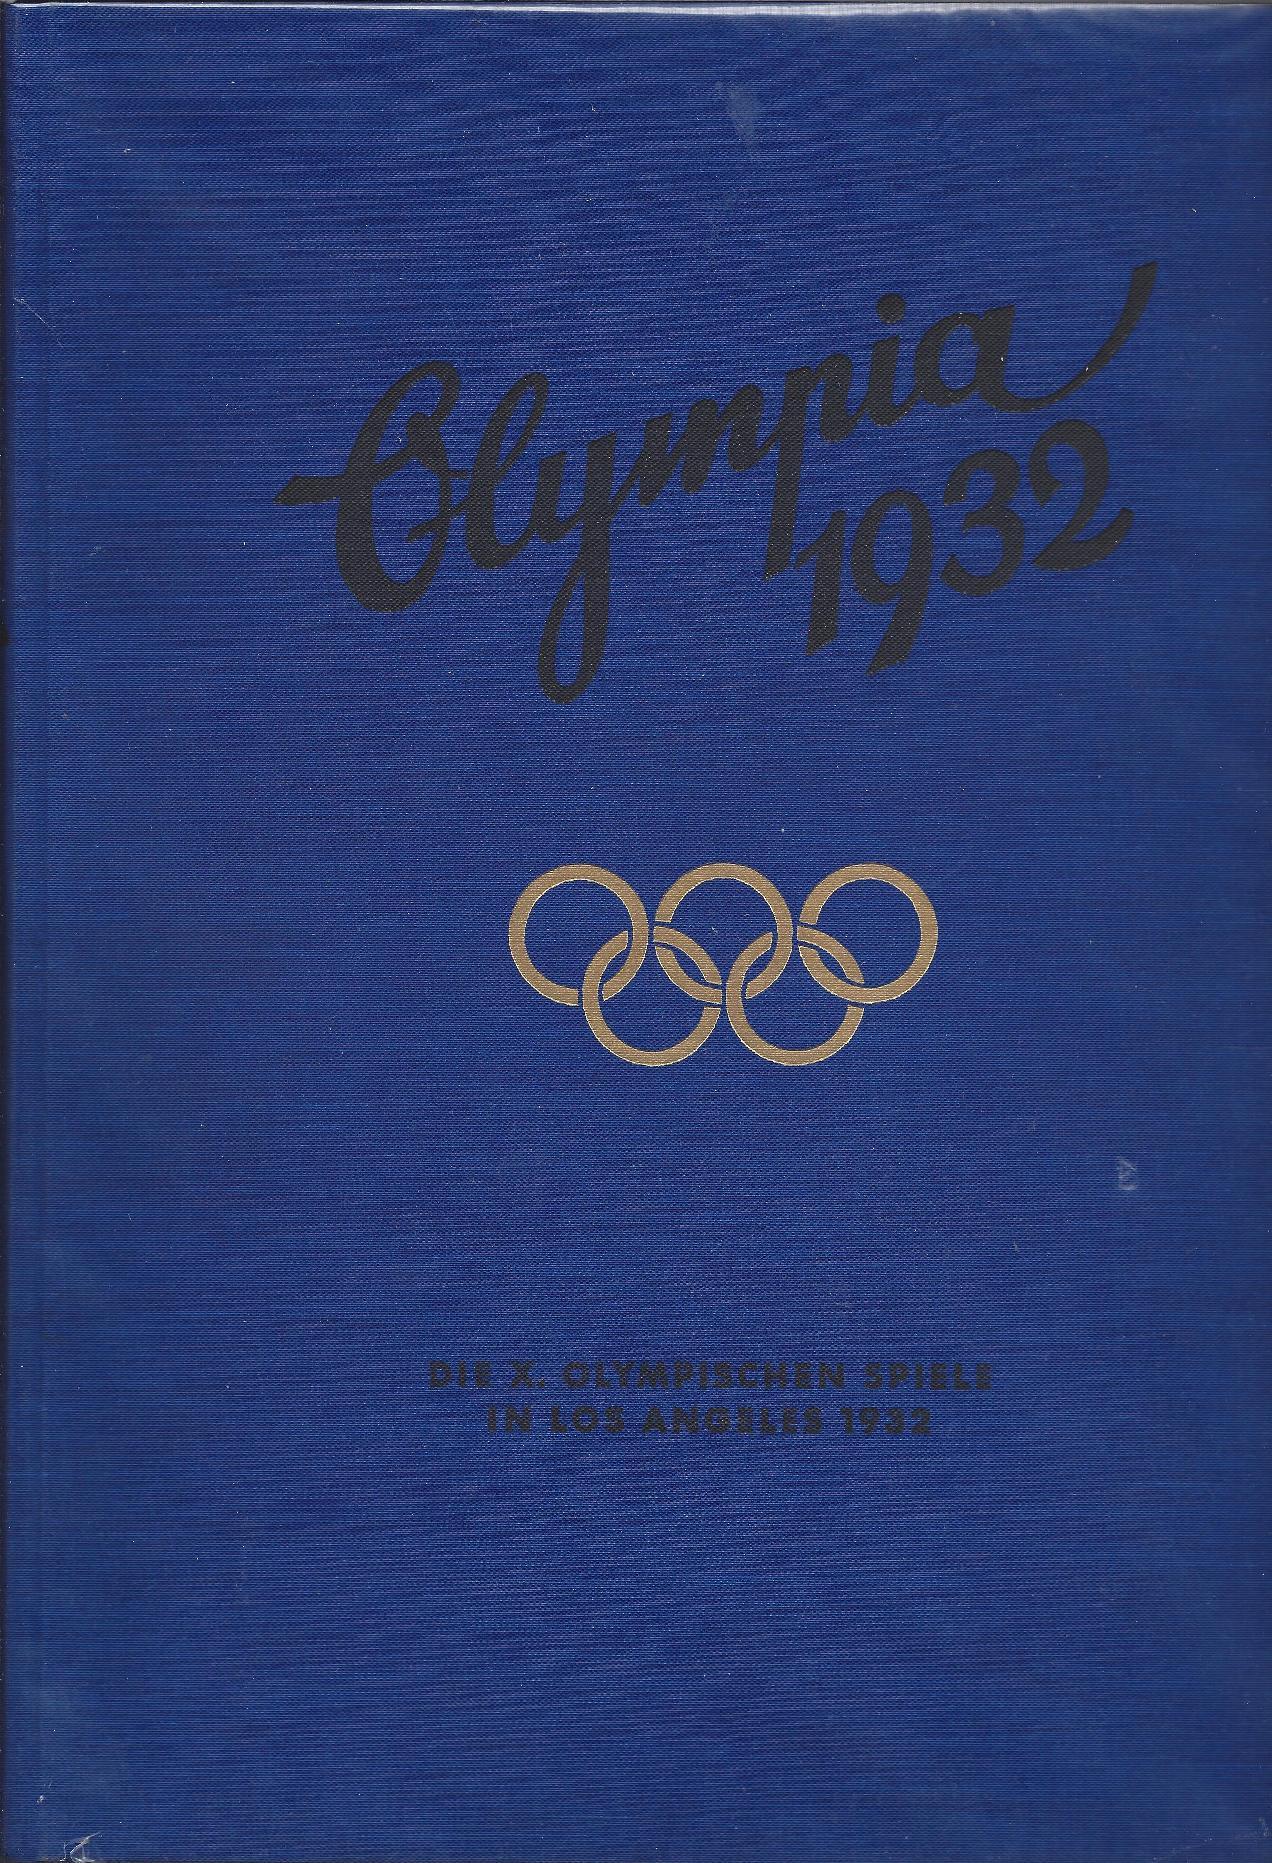 Medaillenspiegel Olympia 1932